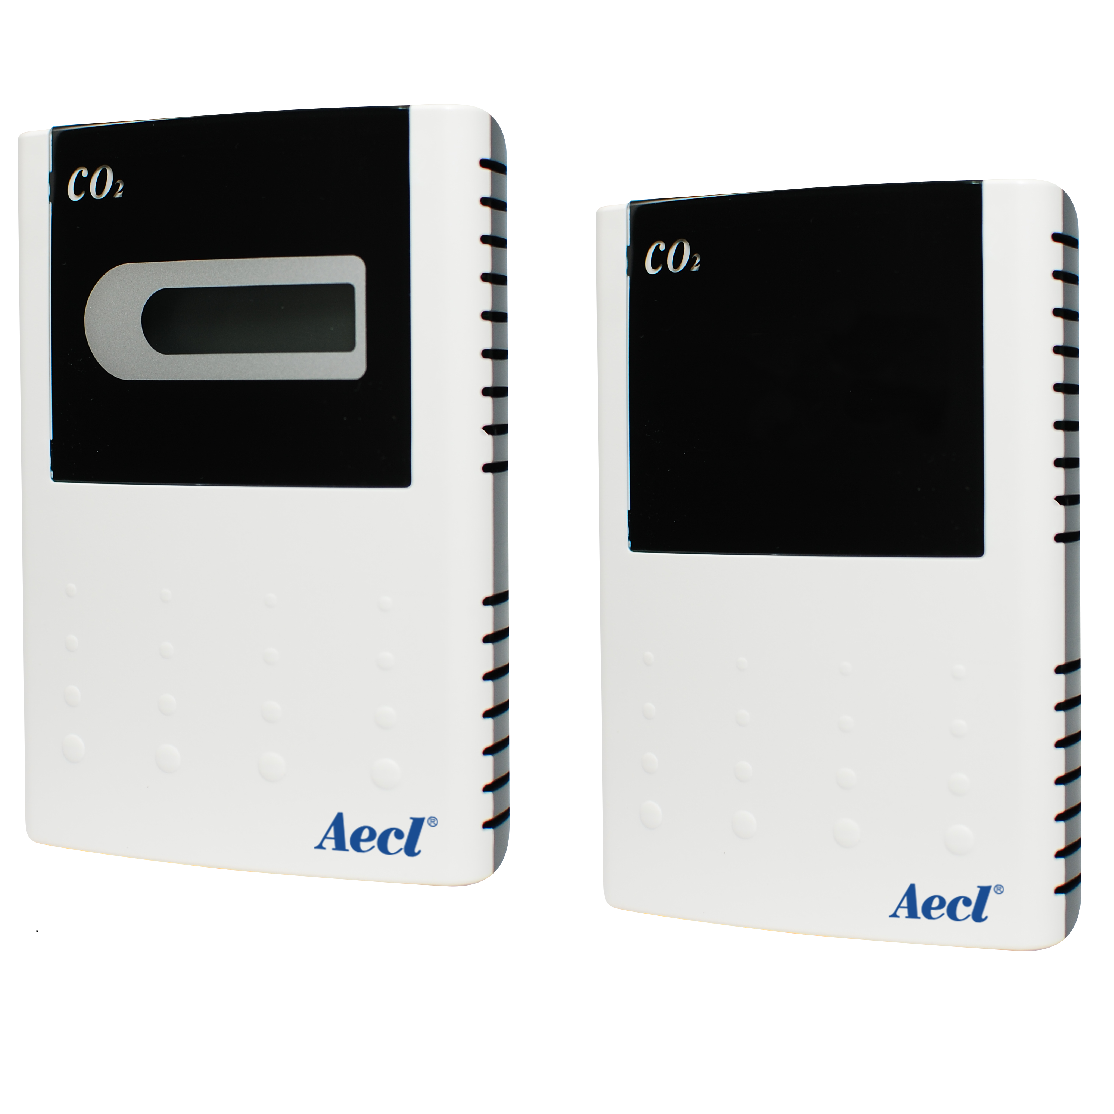 LoRa CO2 sensor